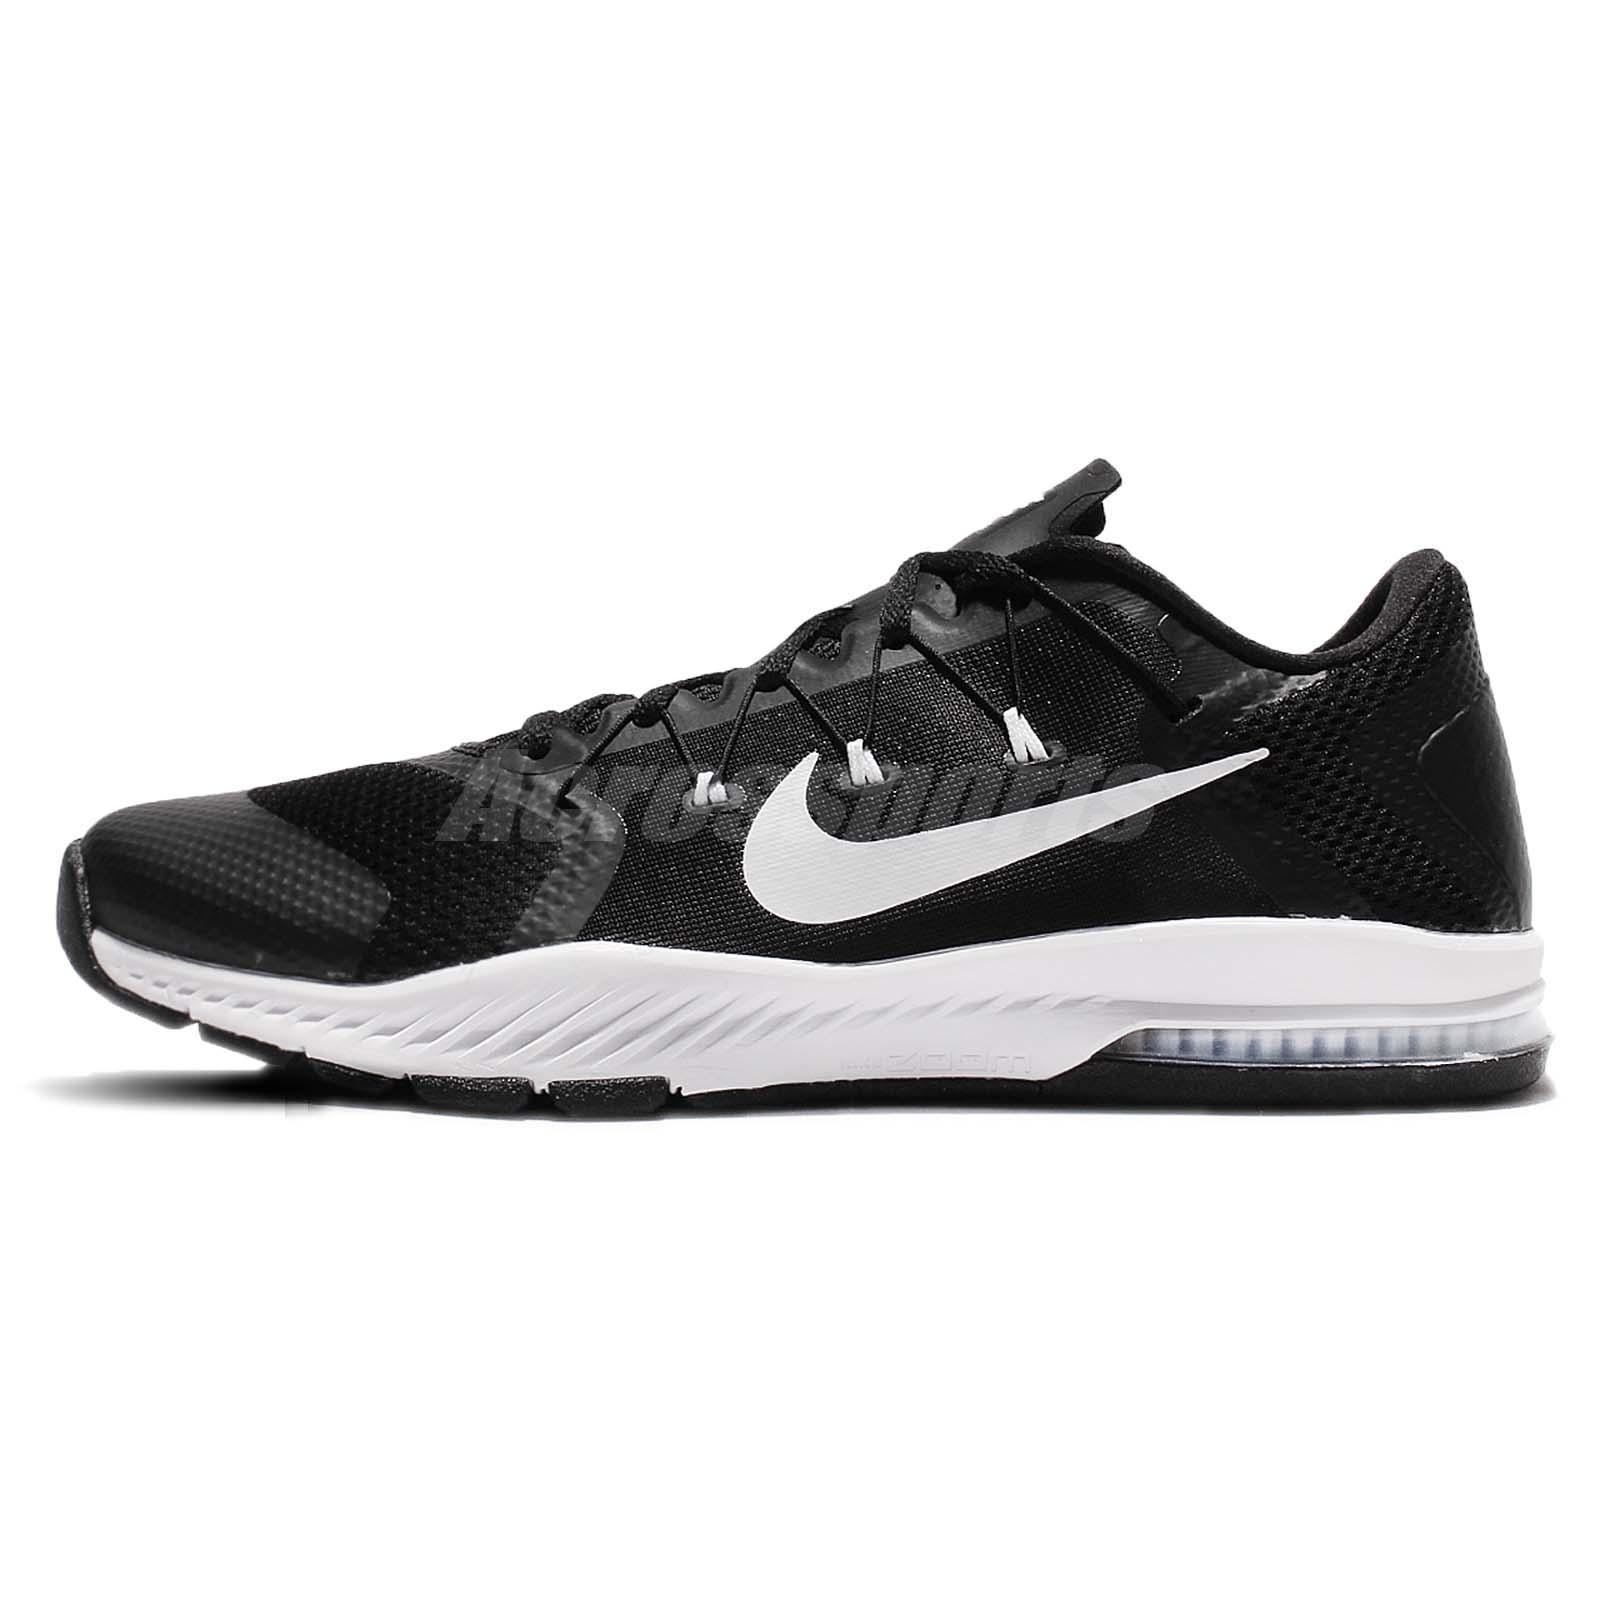 613bea53f004f Nike Zoom Train Complete TB Black White Cross Training Shoes Trainers  898056-002